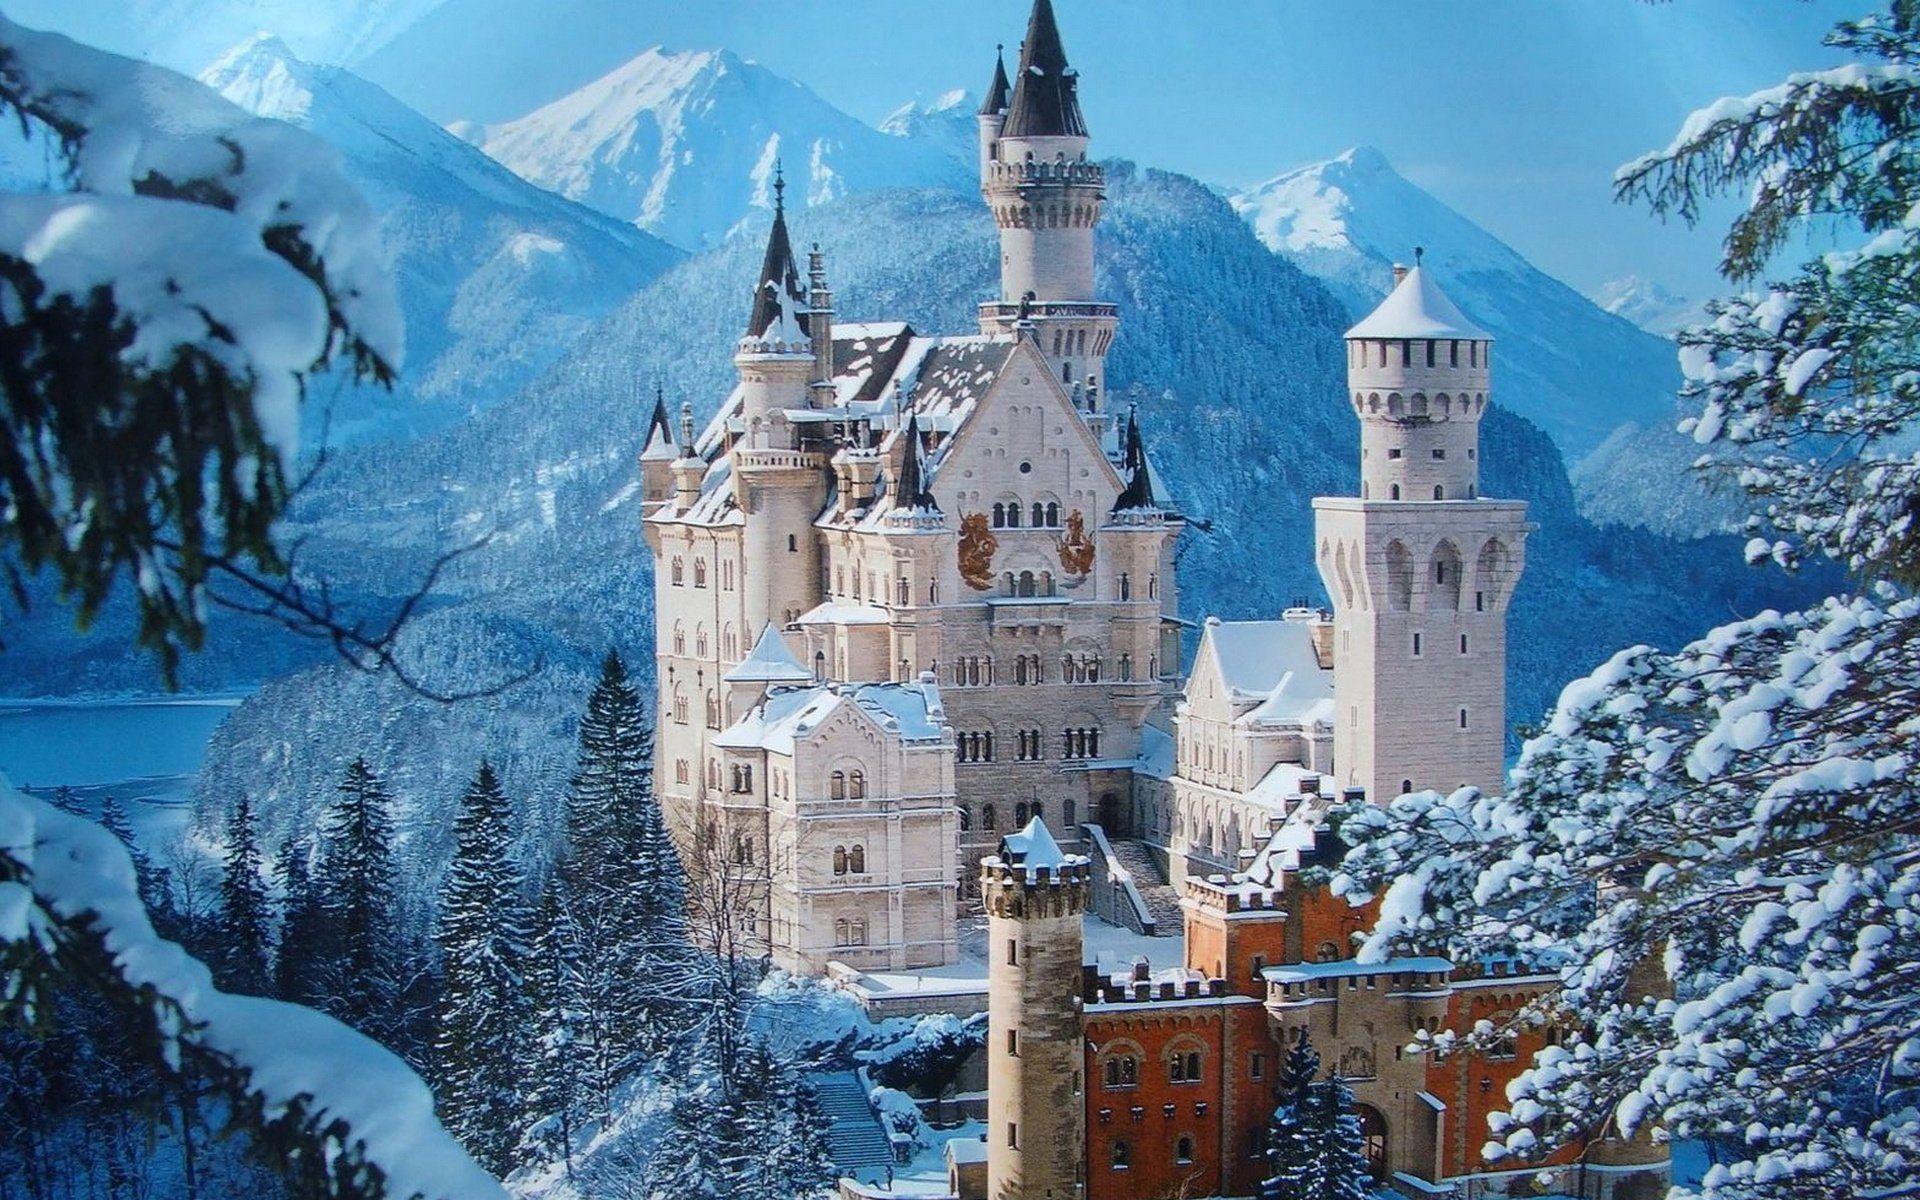 The Castle In Iwaki Etrea Real Picture Is Neuschwanstein Castle In Germany Neuschwanstein Castle Germany Castles Castle